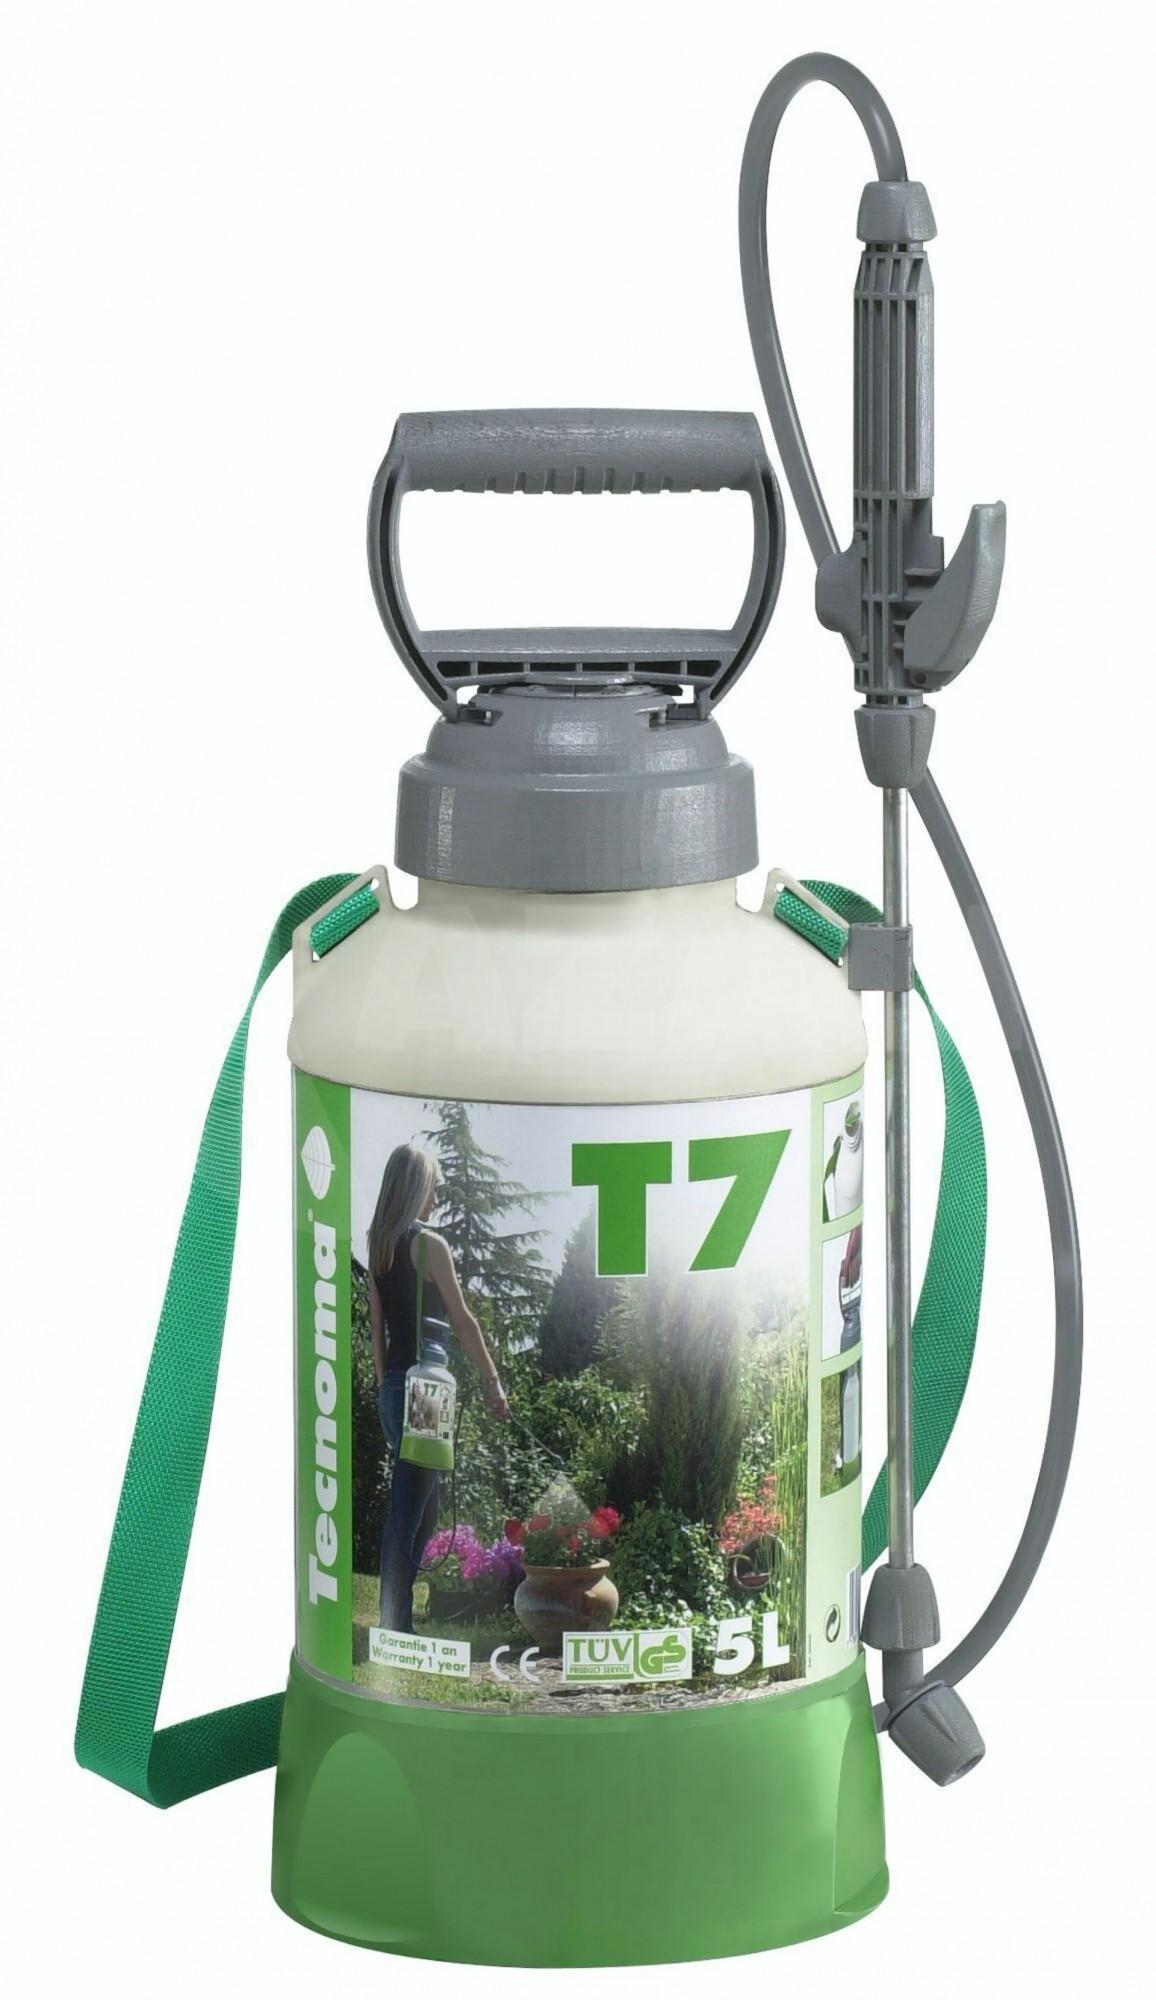 Tecnoma T 7 drukspuit 7 liter